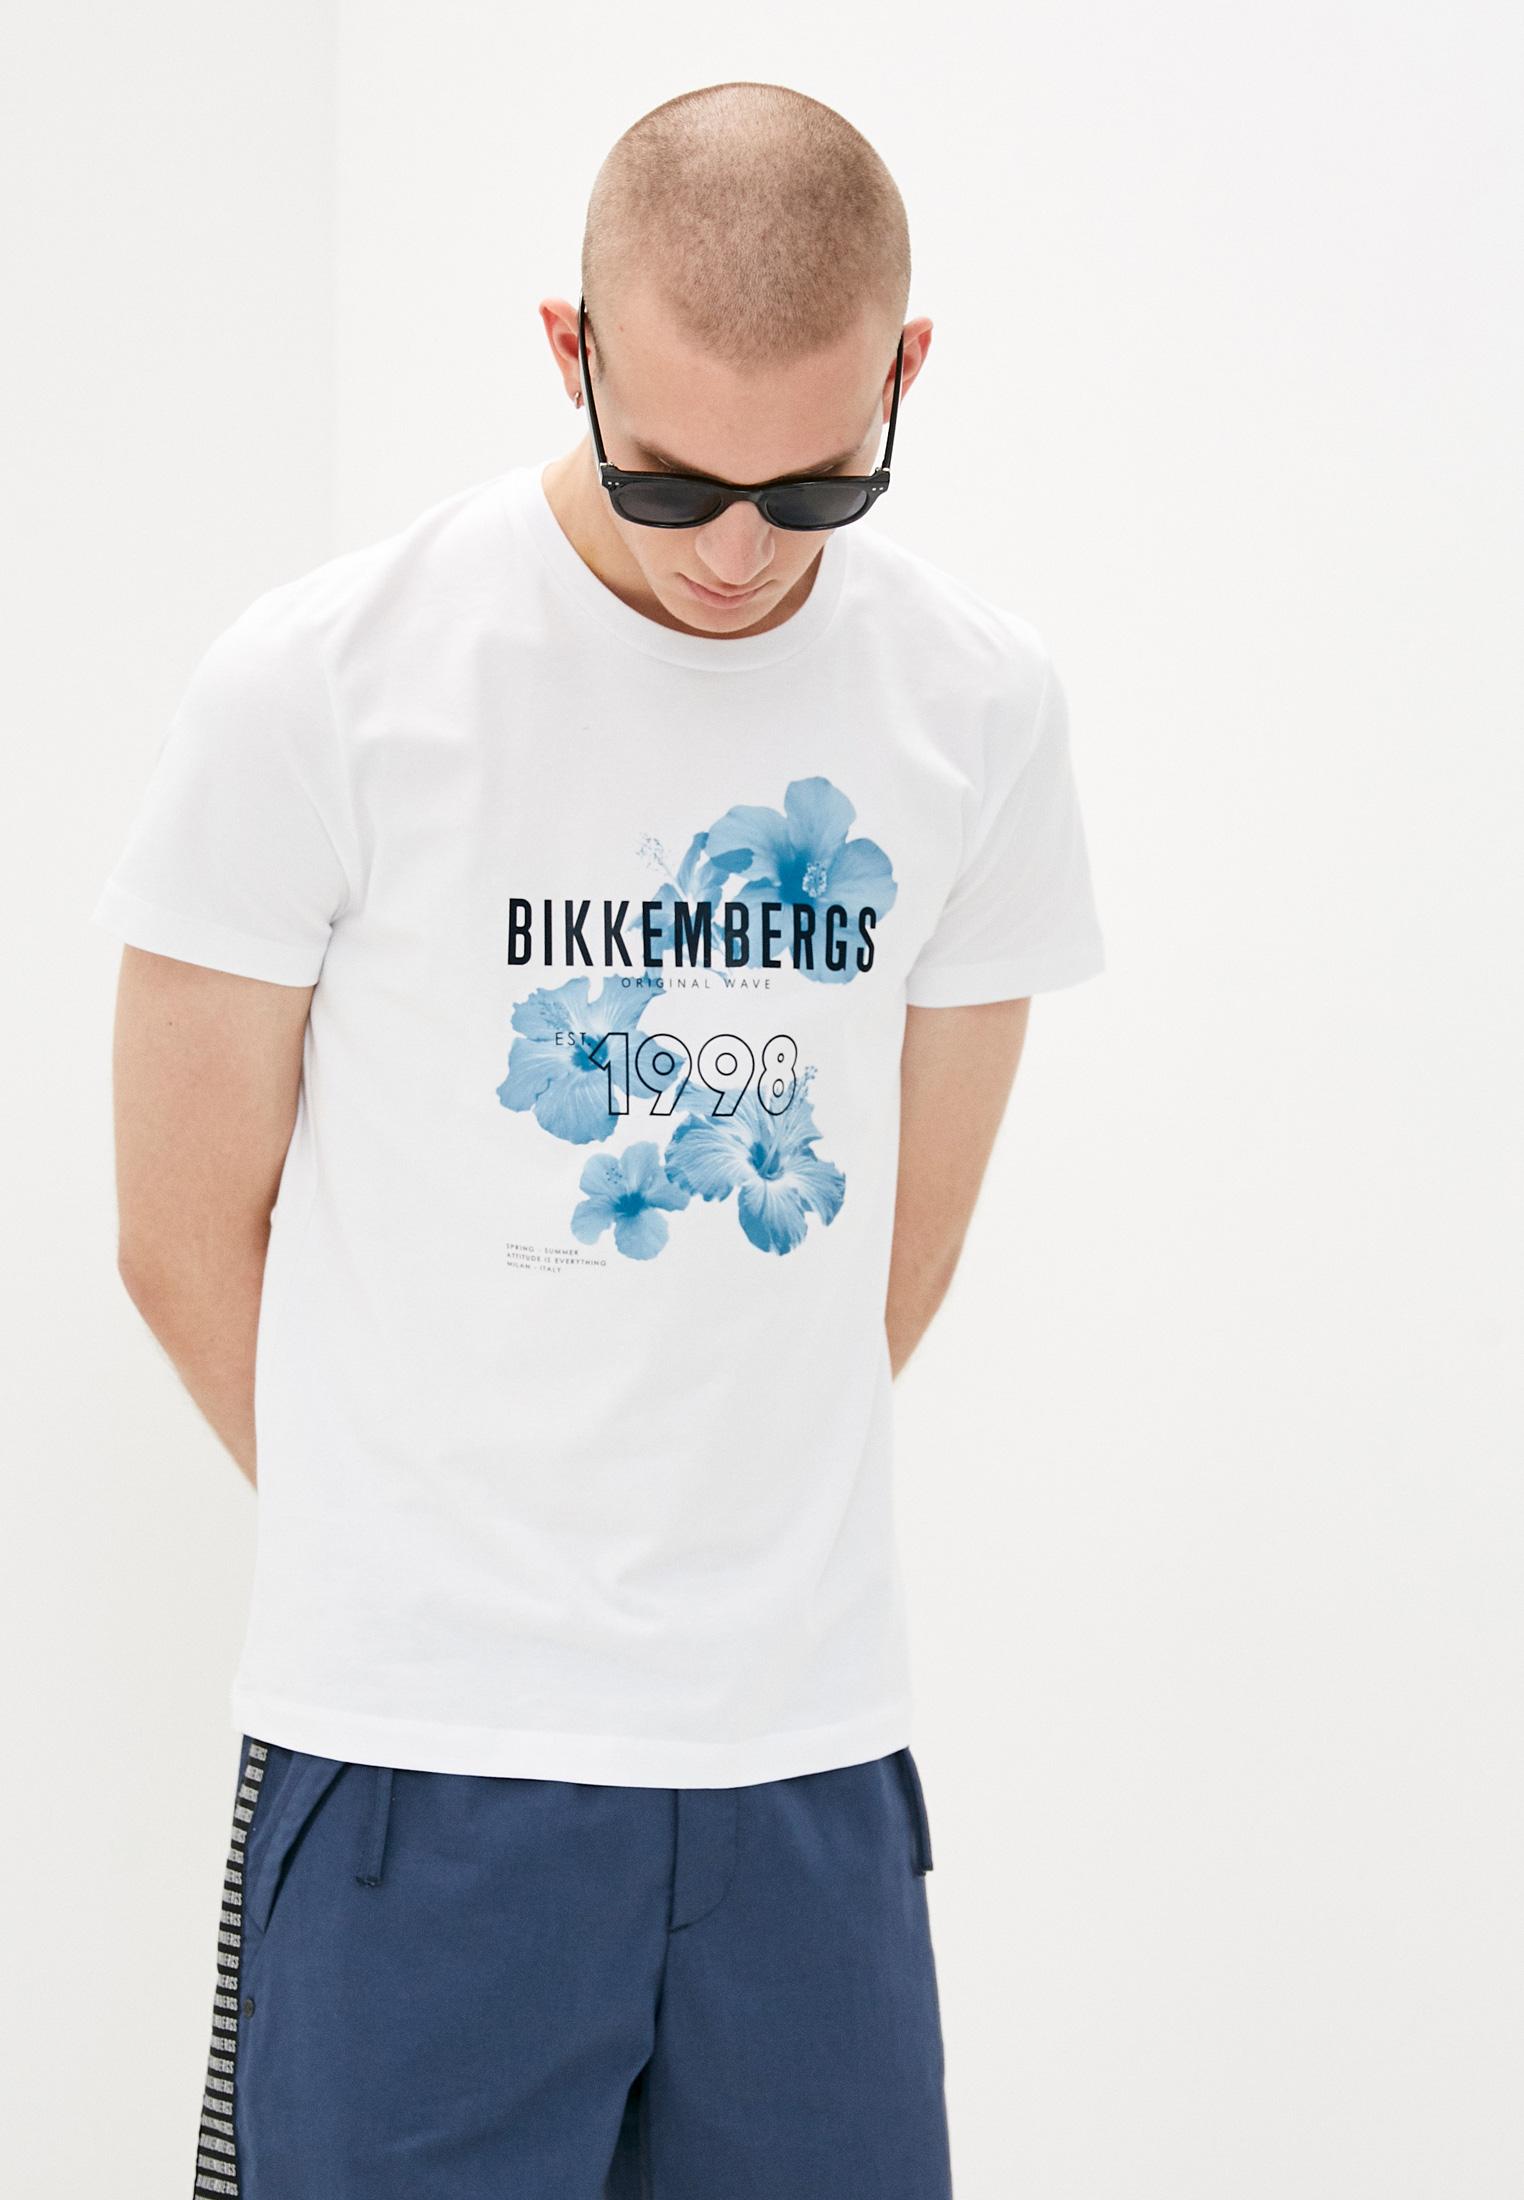 Мужская футболка Bikkembergs (Биккембергс) C 4 101 27 E 2231